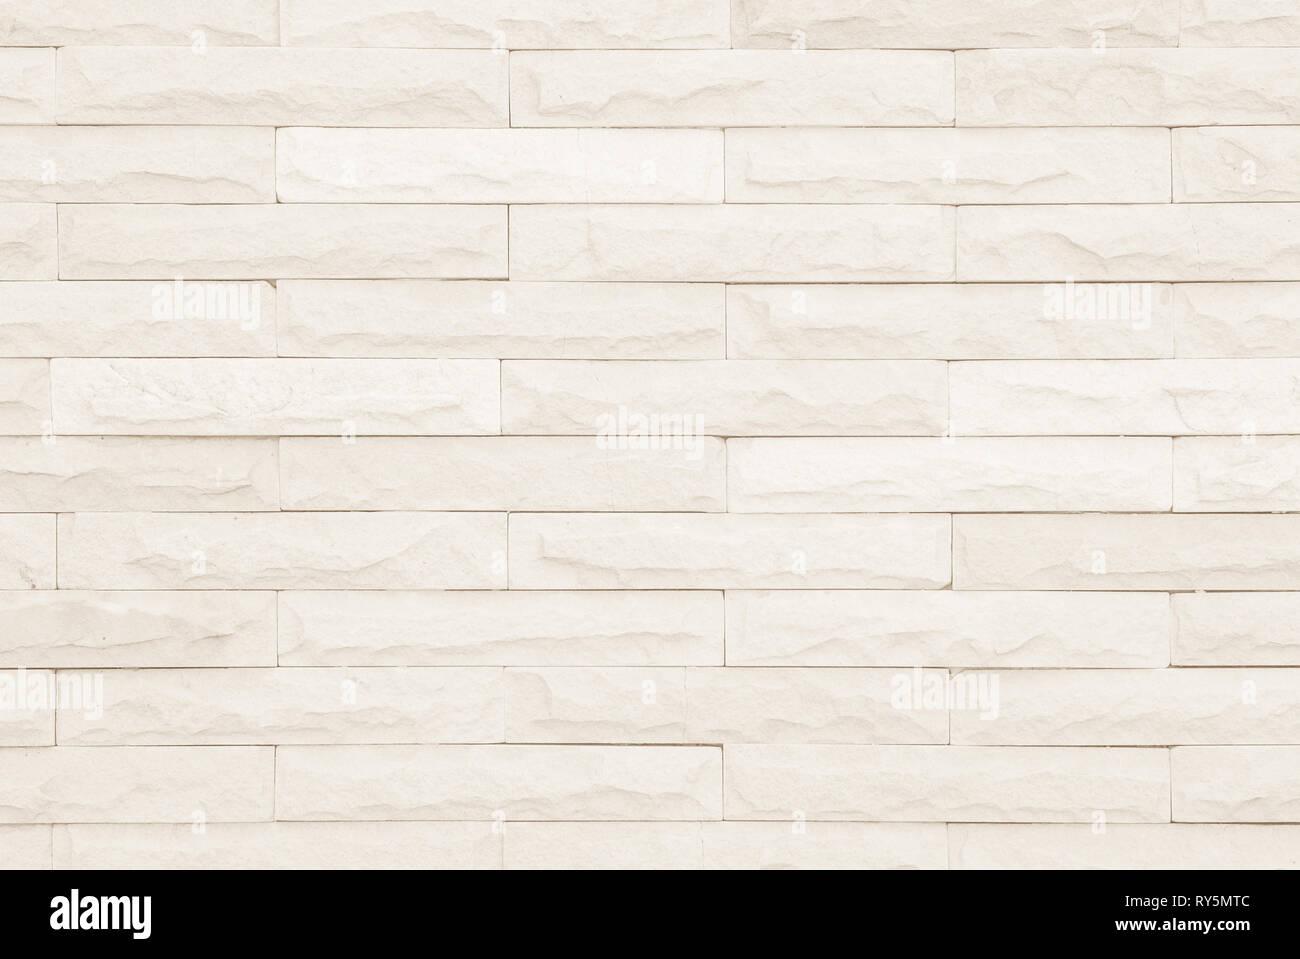 Cream And White Brick Wall Texture Background Brickwork Or